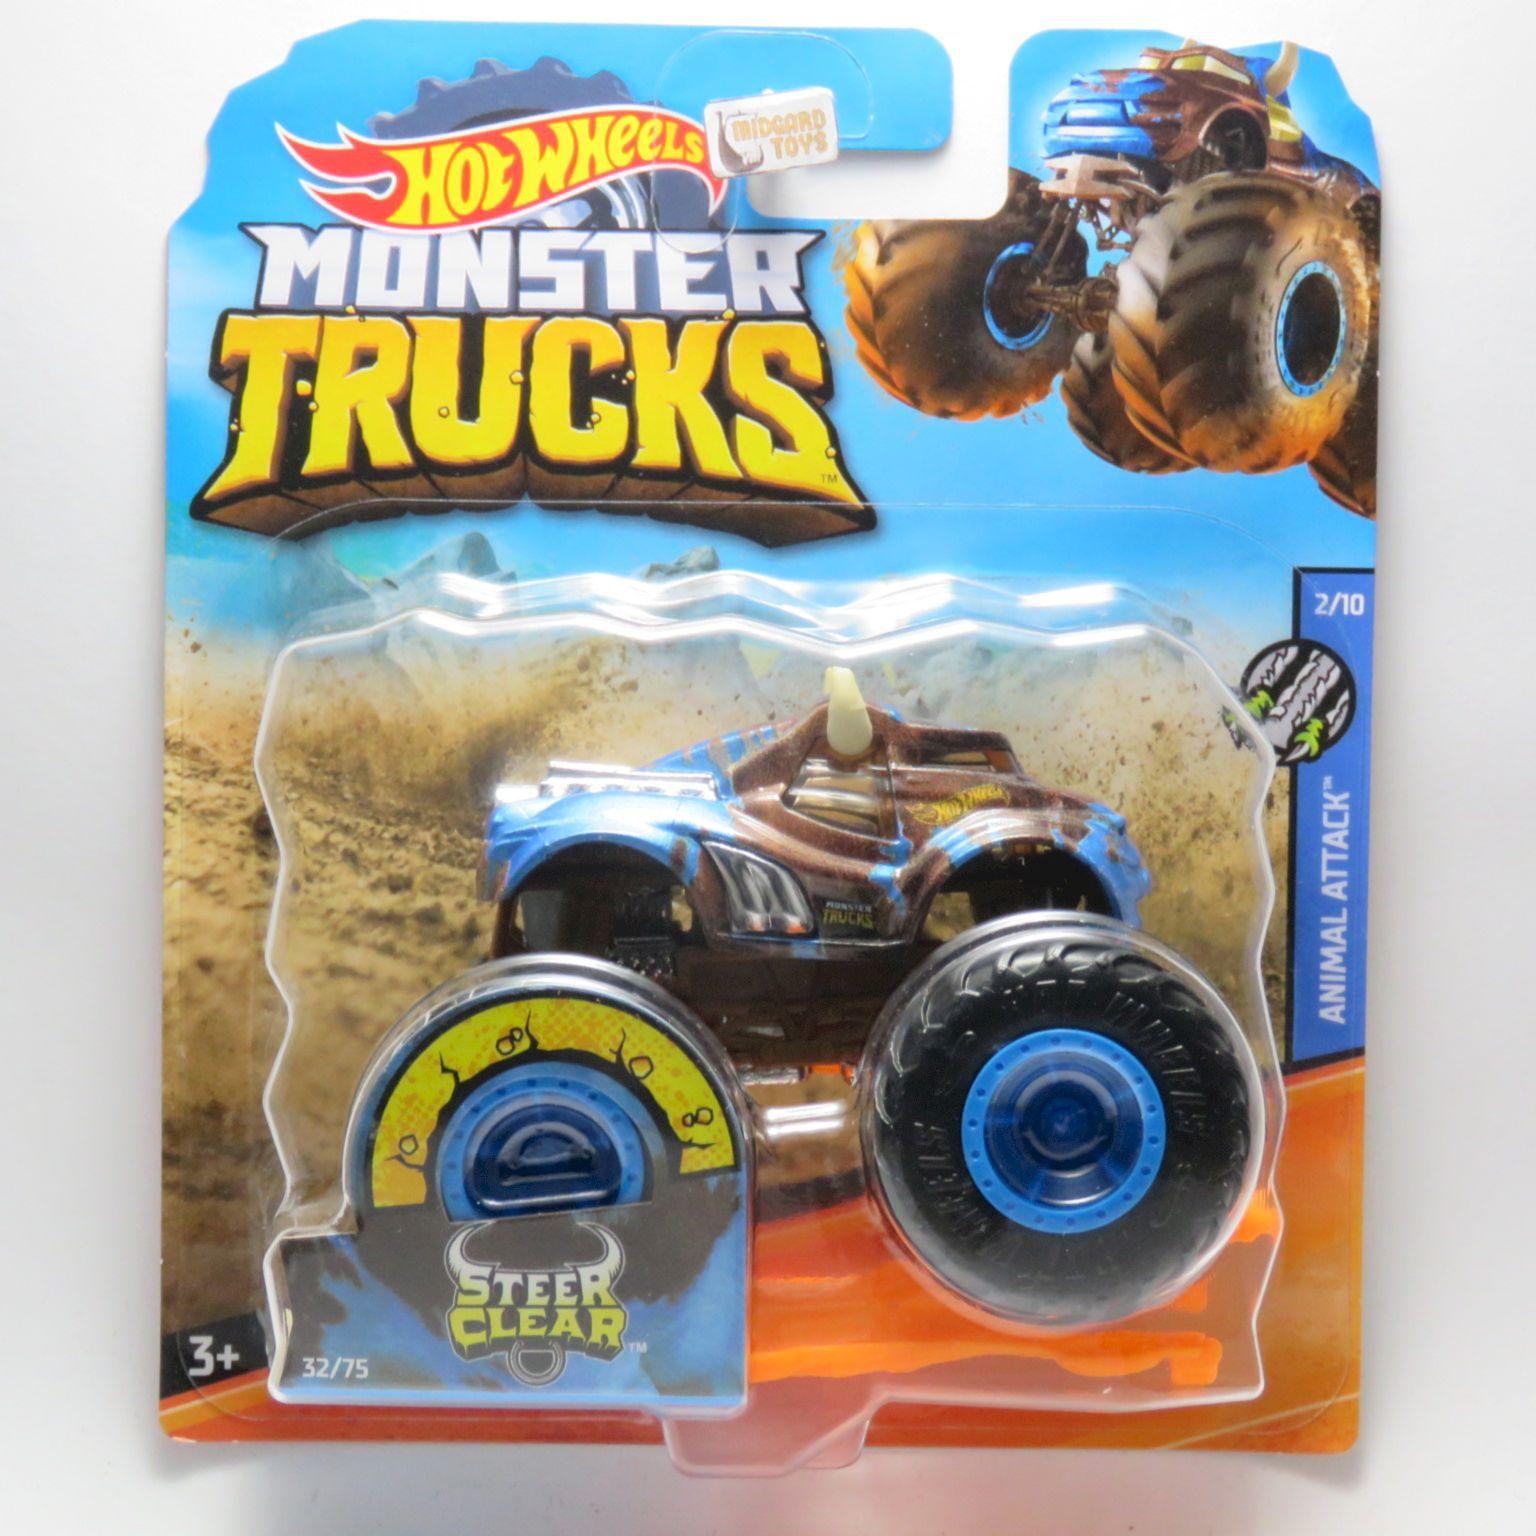 Midgard Toys Os Melhores Artigos De Todo O Reino Monster Trucks Steer Clear 32 1 64 Hot Wheels